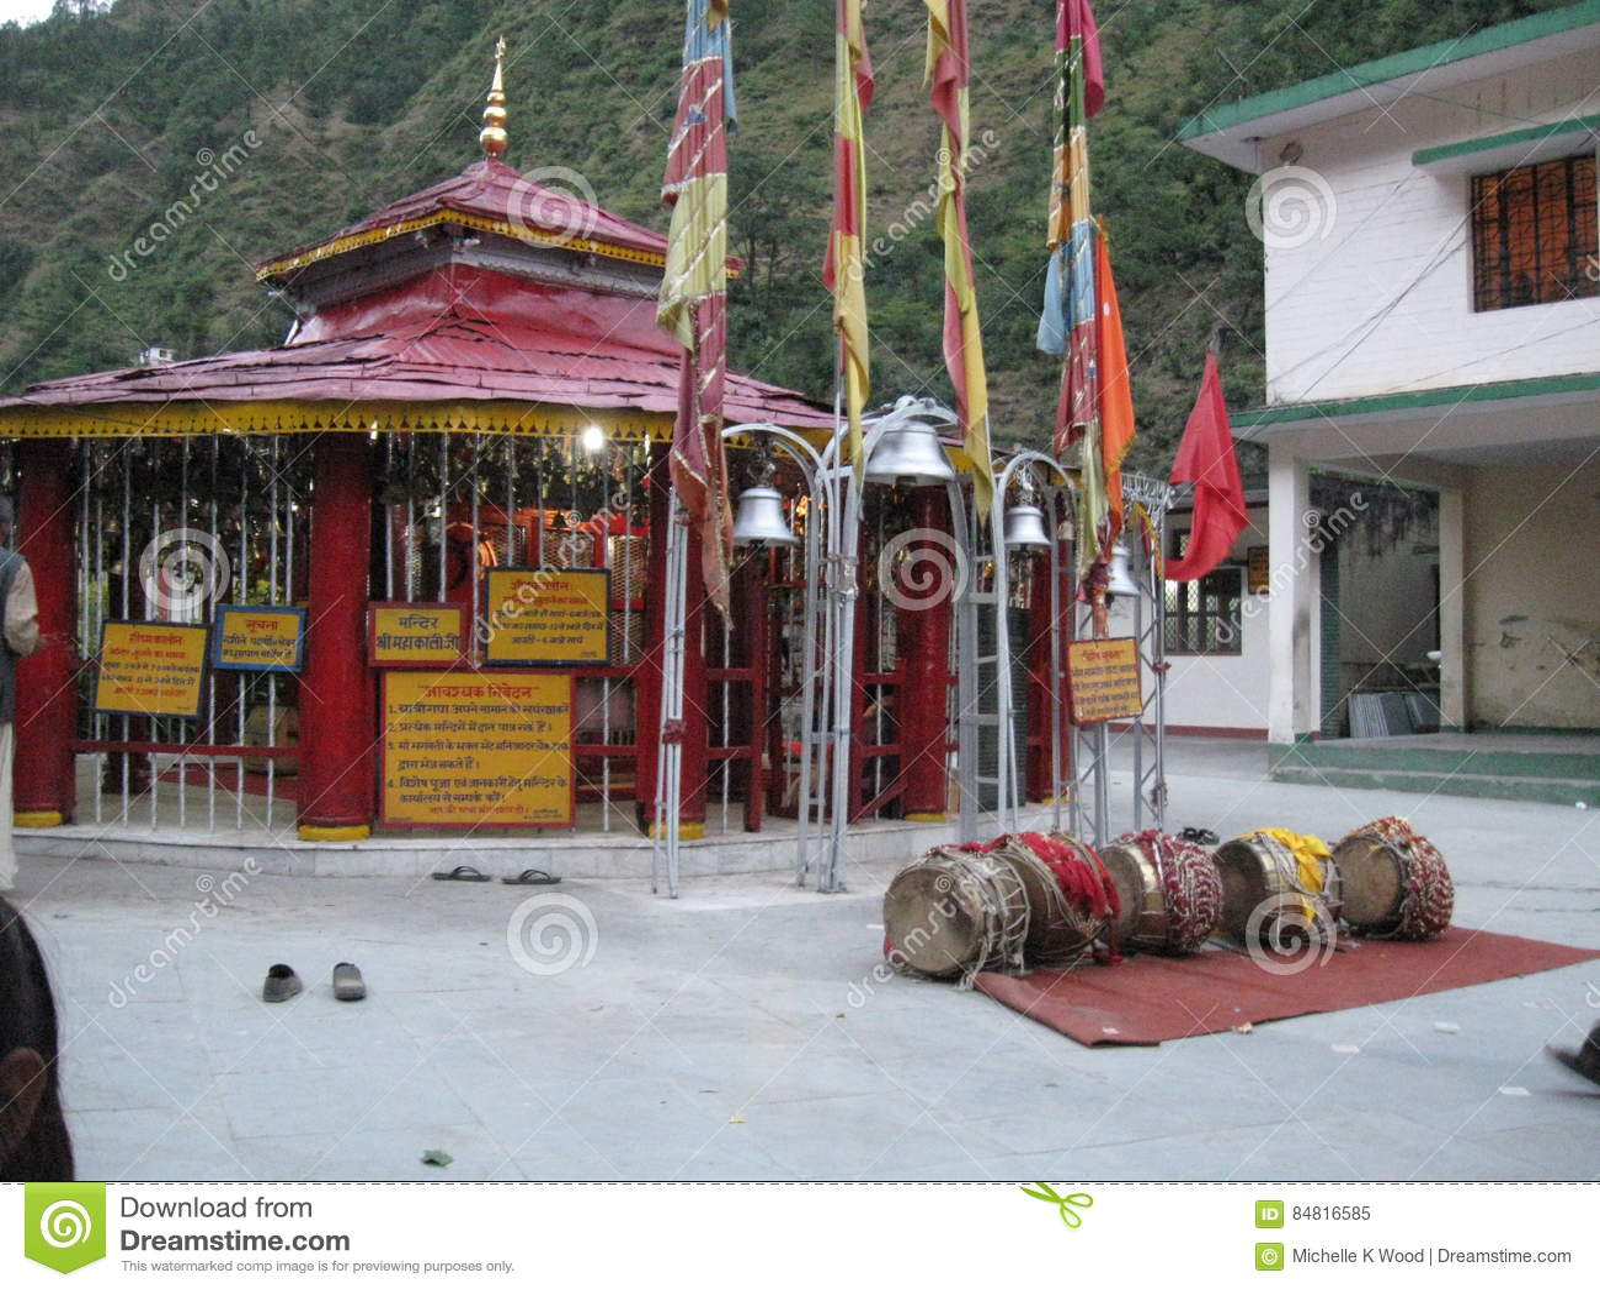 Kali Temple at KaliMath India